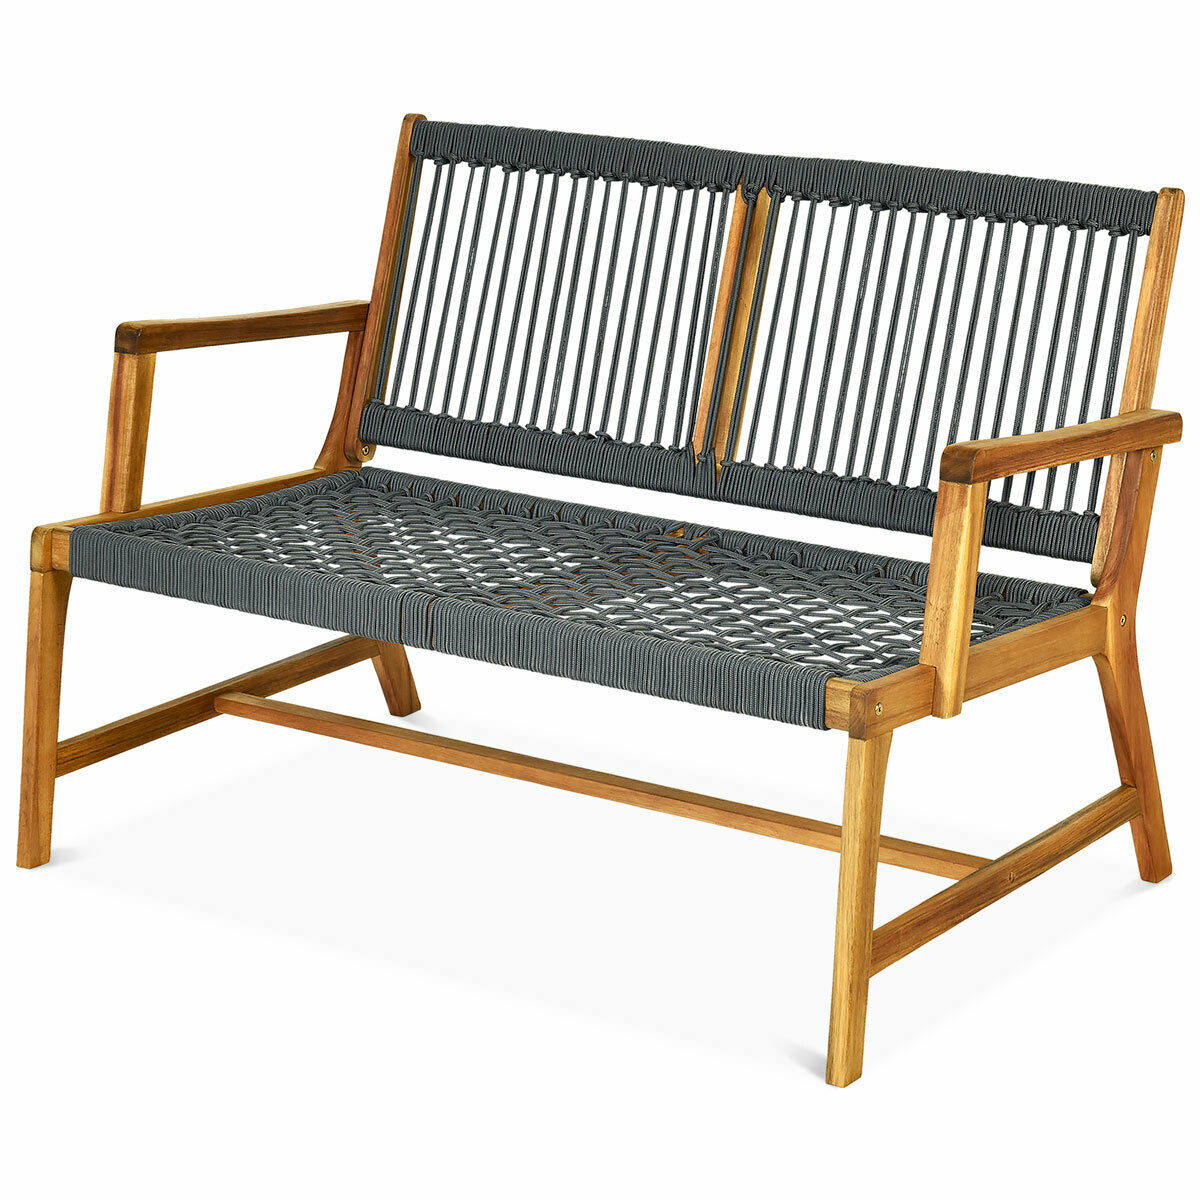 Picture of: Lifetime Wood Alternative Patio Glider Bench Outdoor Furniture Garden Porch Yard For Sale Online Ebay